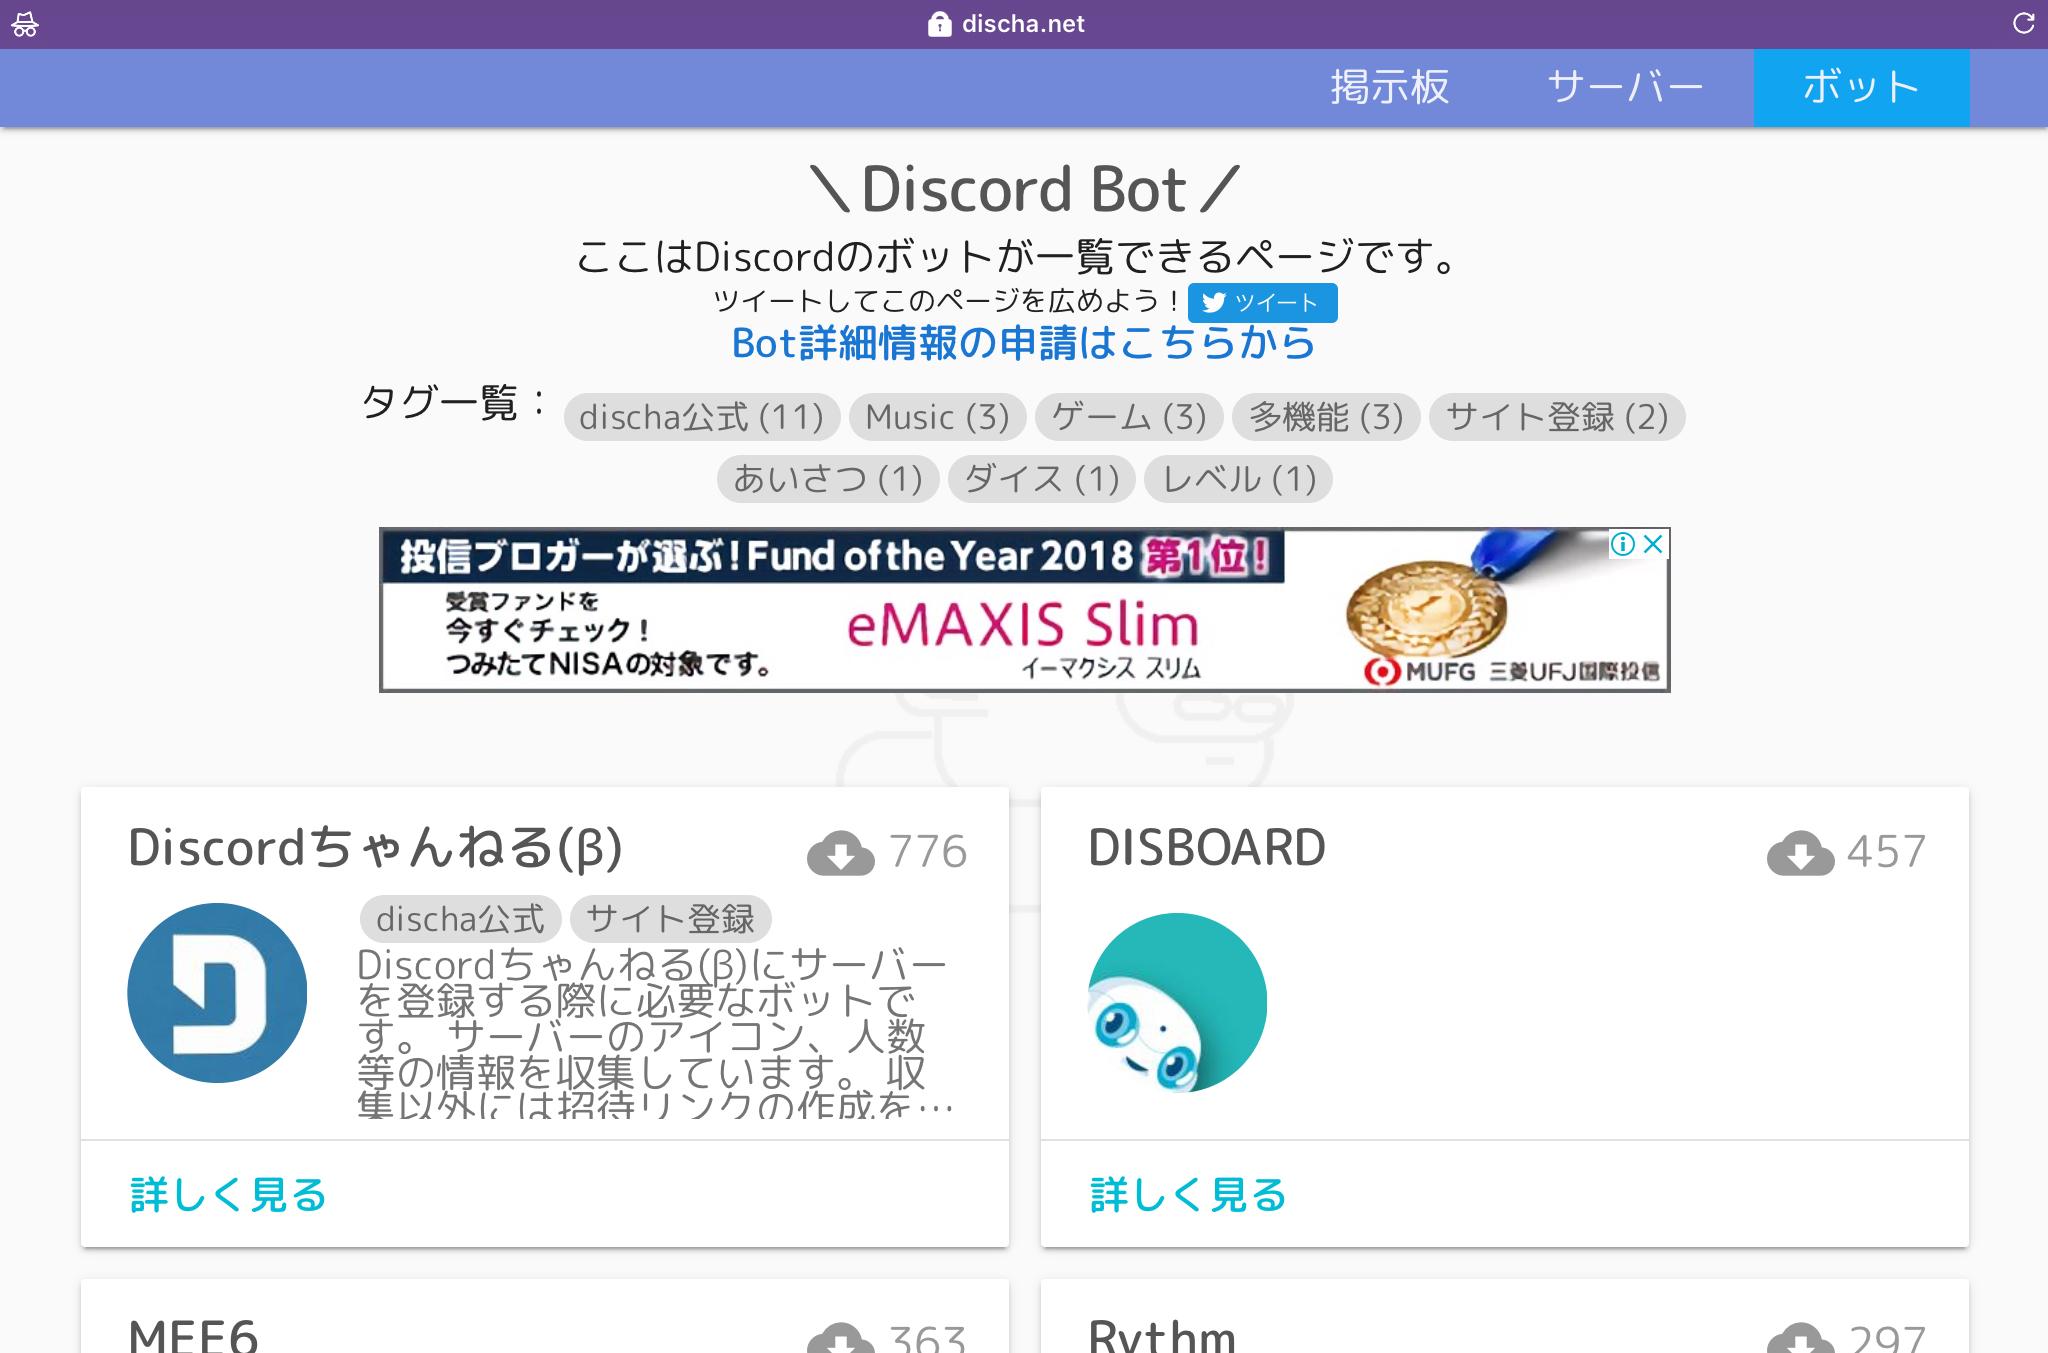 Discord Disboard Bot